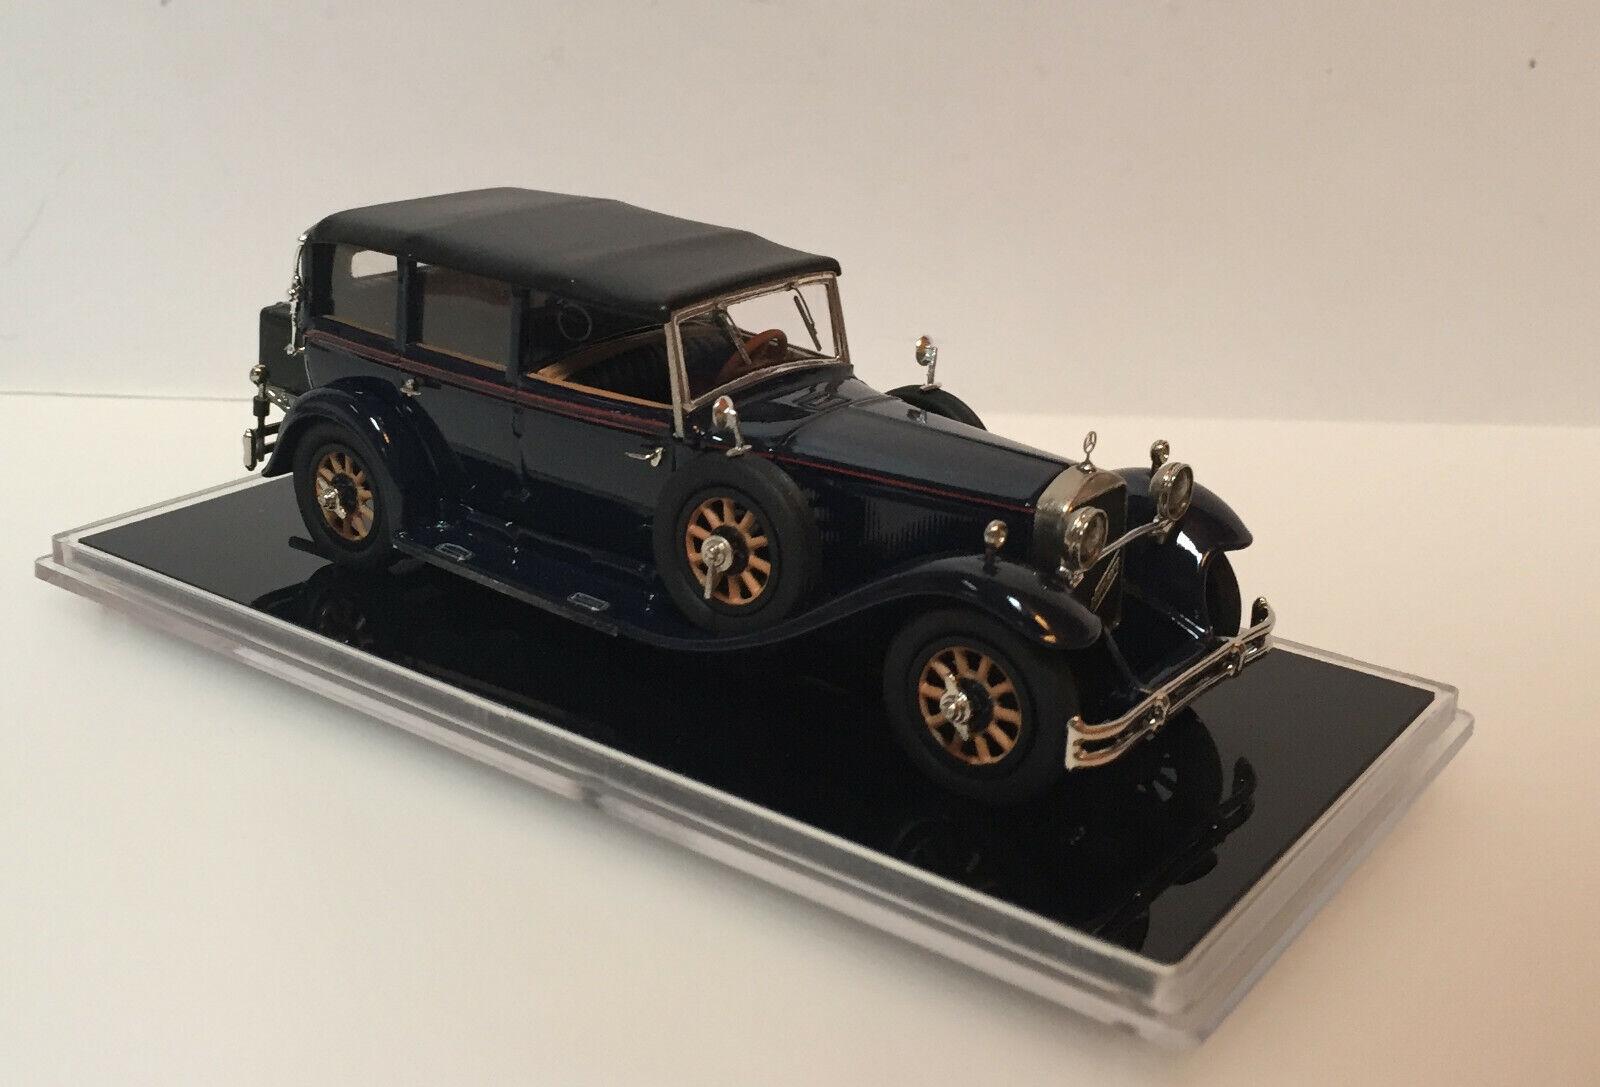 "1 43 1930 MERCEDES BENZ 460 Cabriolet F ""NURBURG   Top Up Limousine"